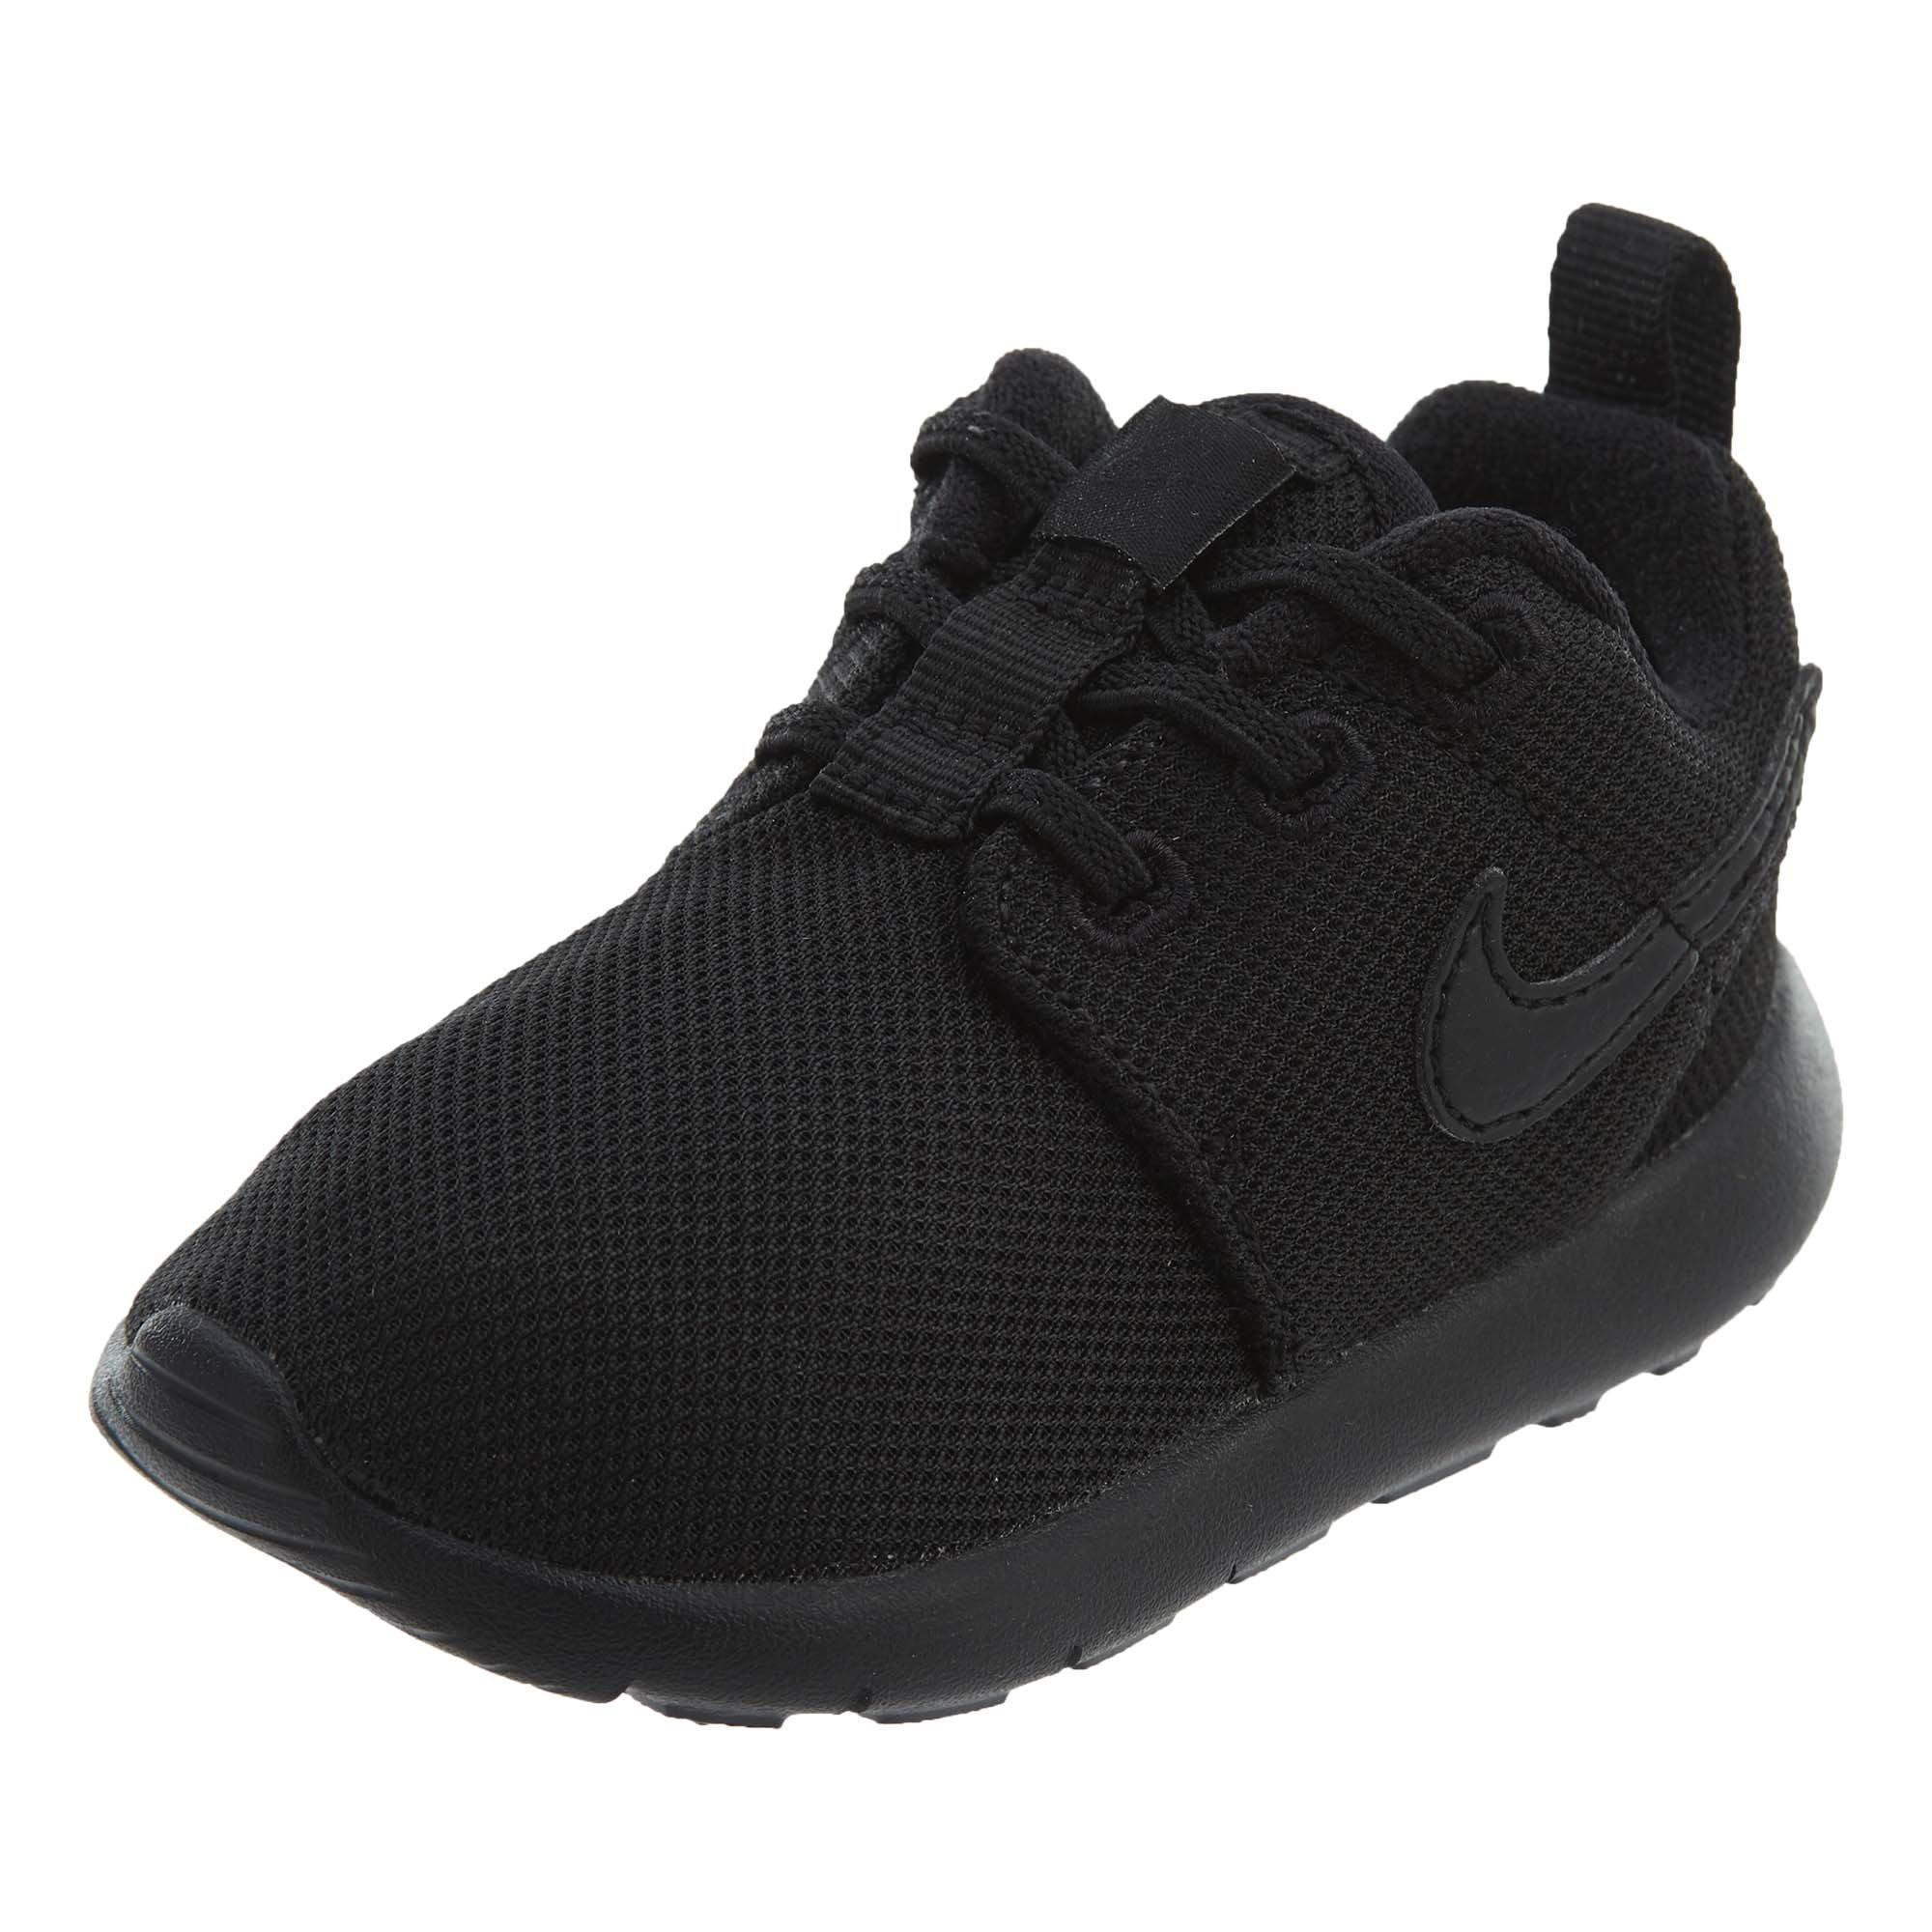 Nike Toddlers' Roshe One (TDV) Black Fabric Running Shoe 6 by Nike (Image #1)